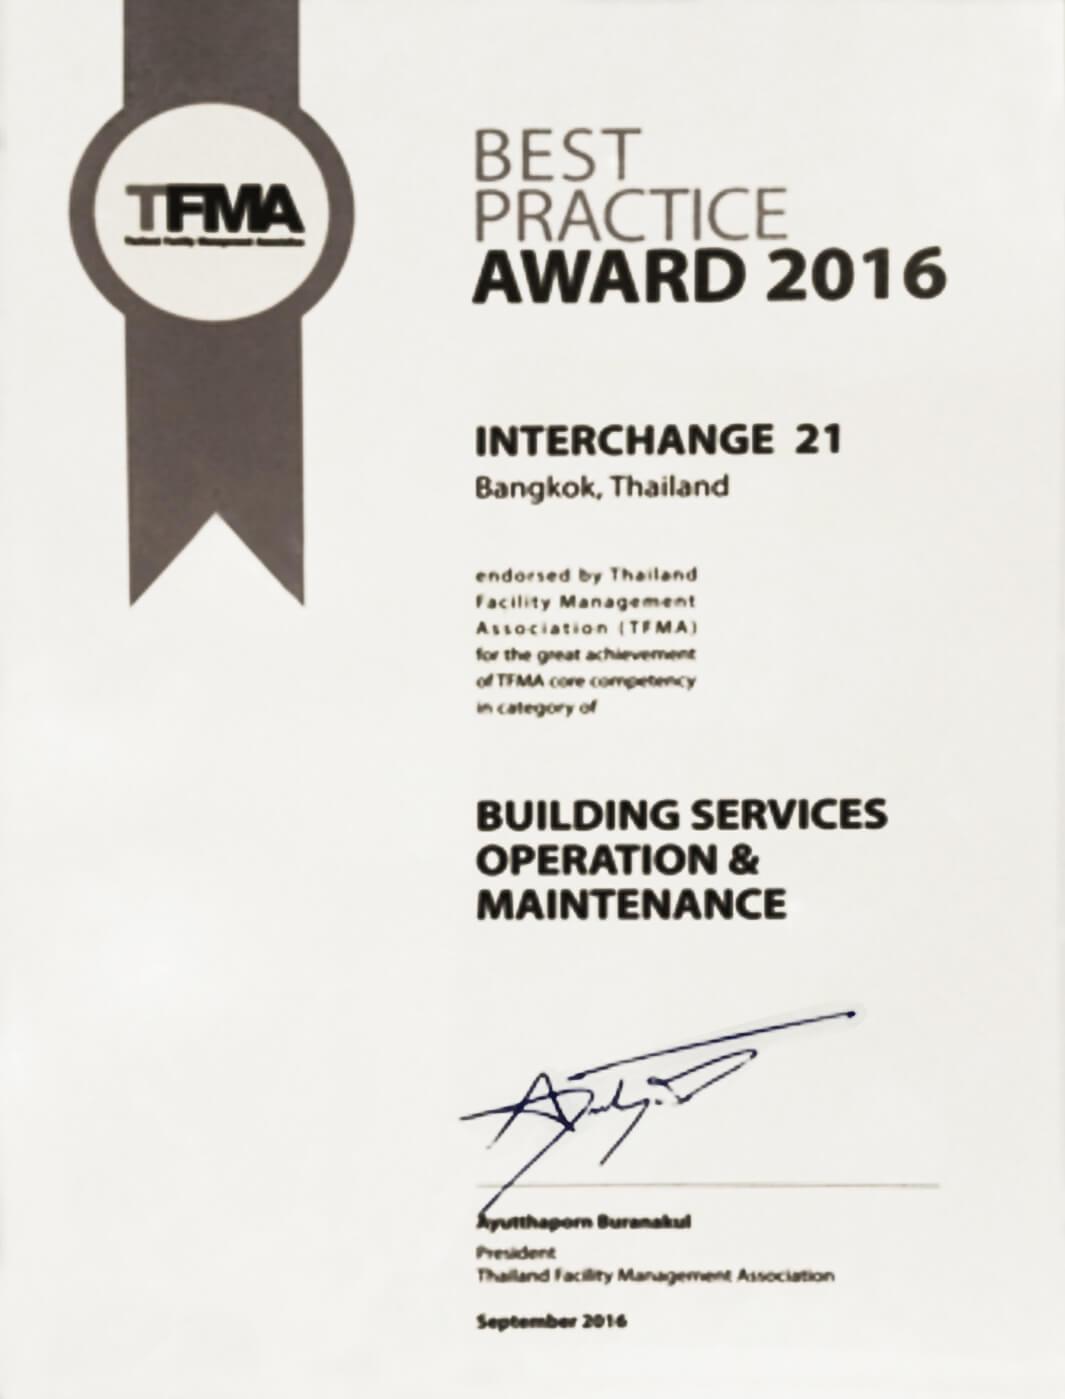 Awards Achievements Certifications Interchange 21